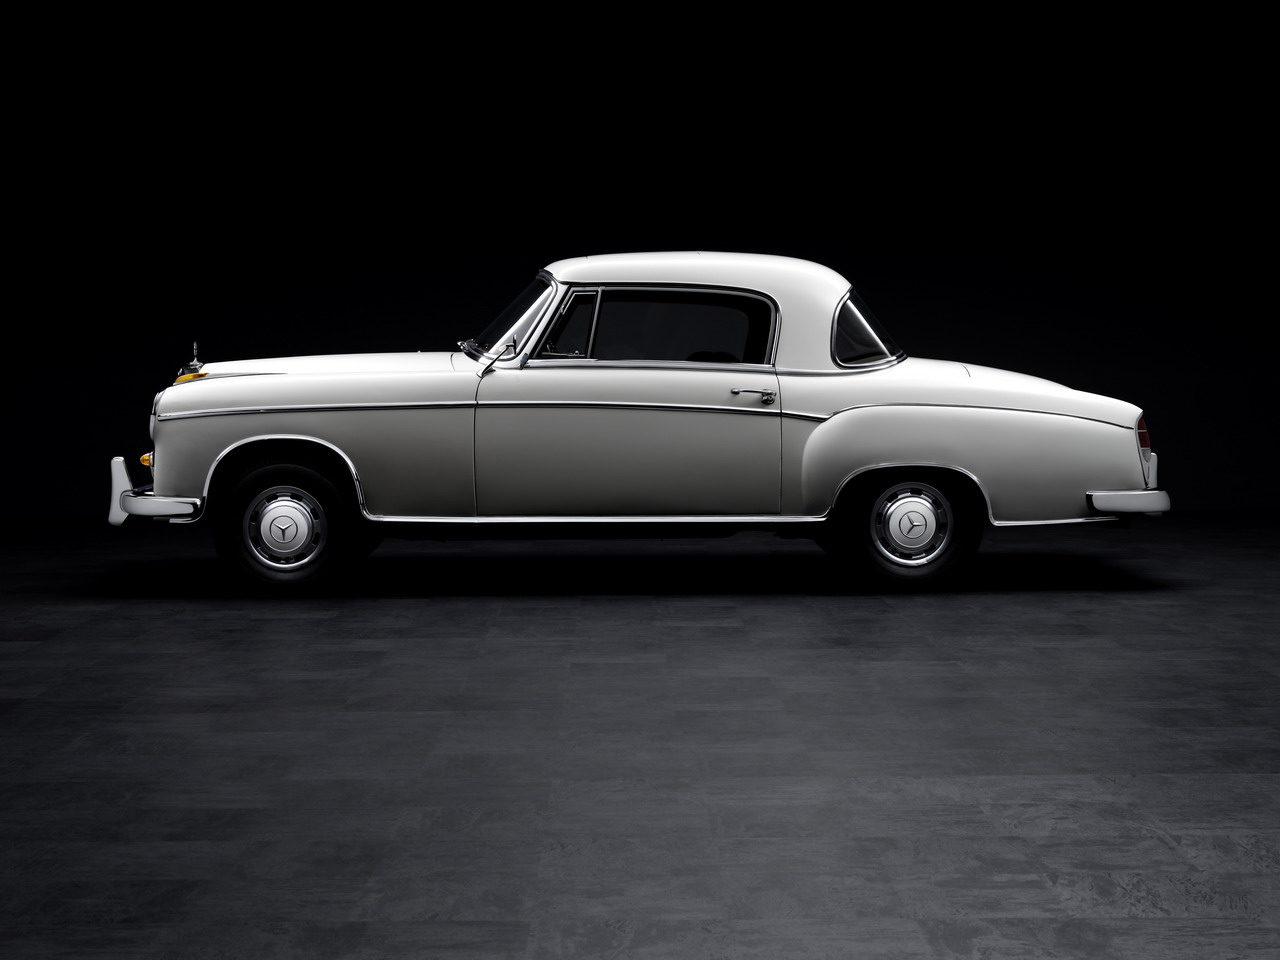 topworldauto photos of mercedes benz 220se coupe photo galleries. Black Bedroom Furniture Sets. Home Design Ideas